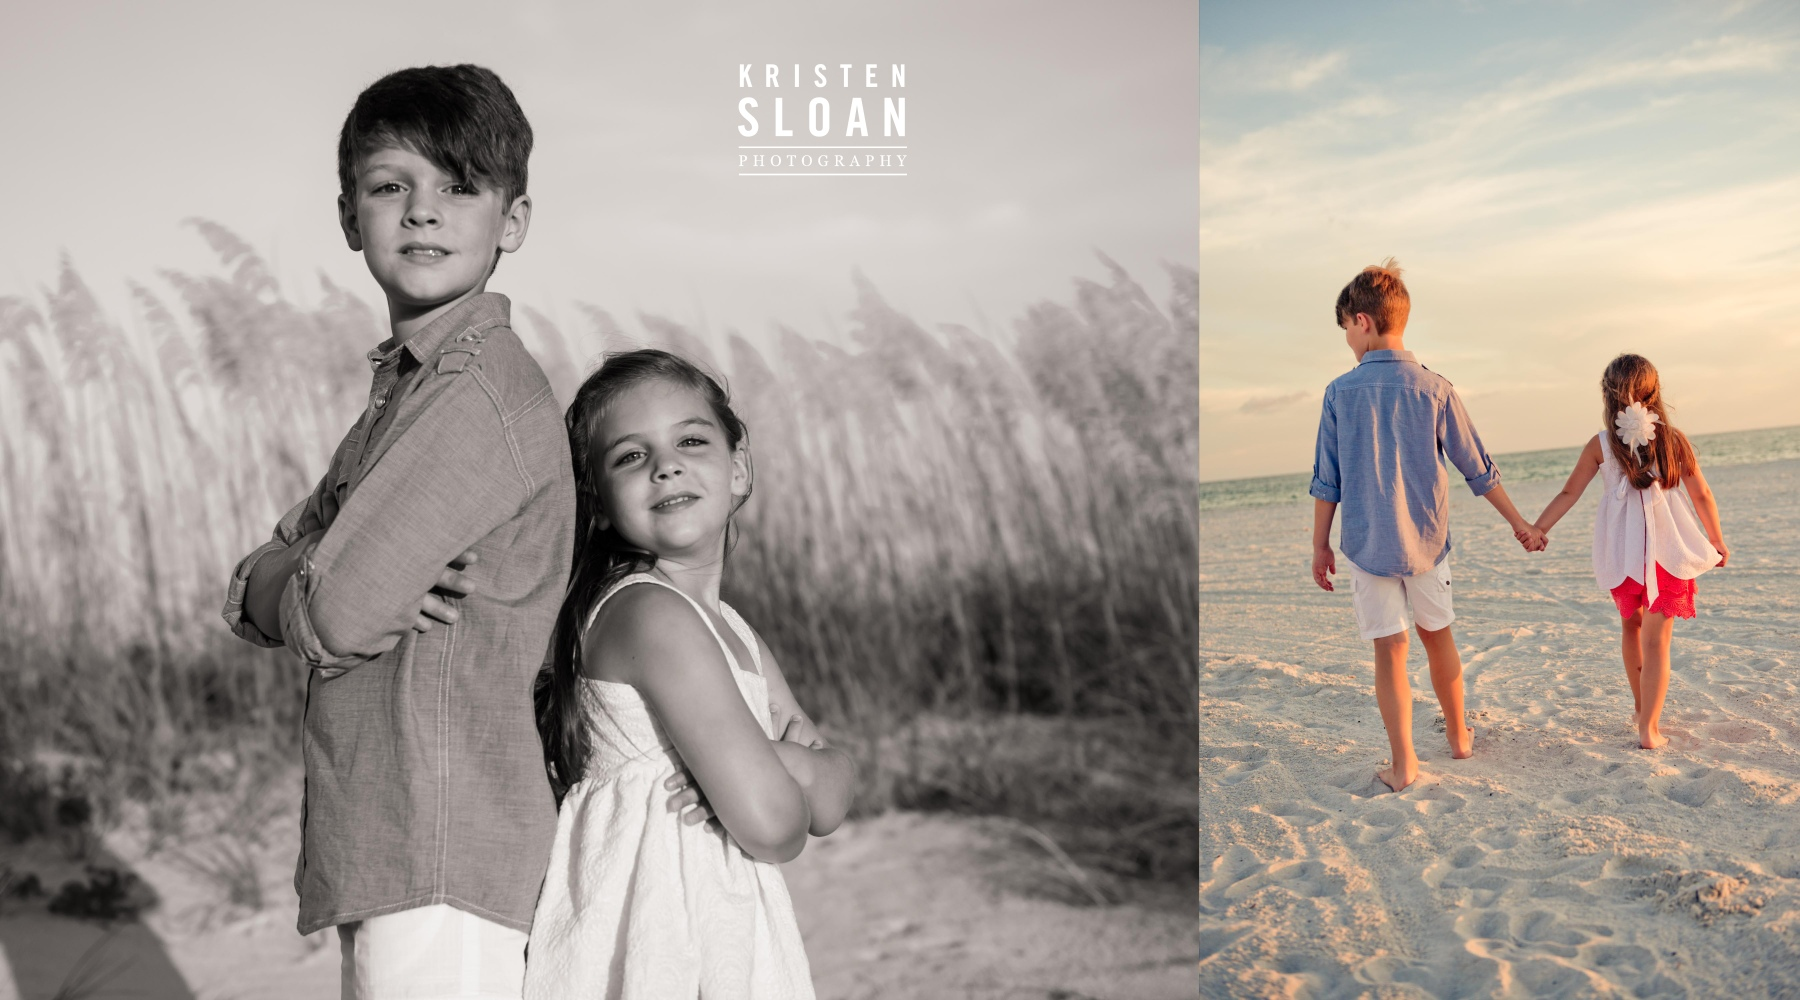 Treasure Island Photographer Kristen Sloan